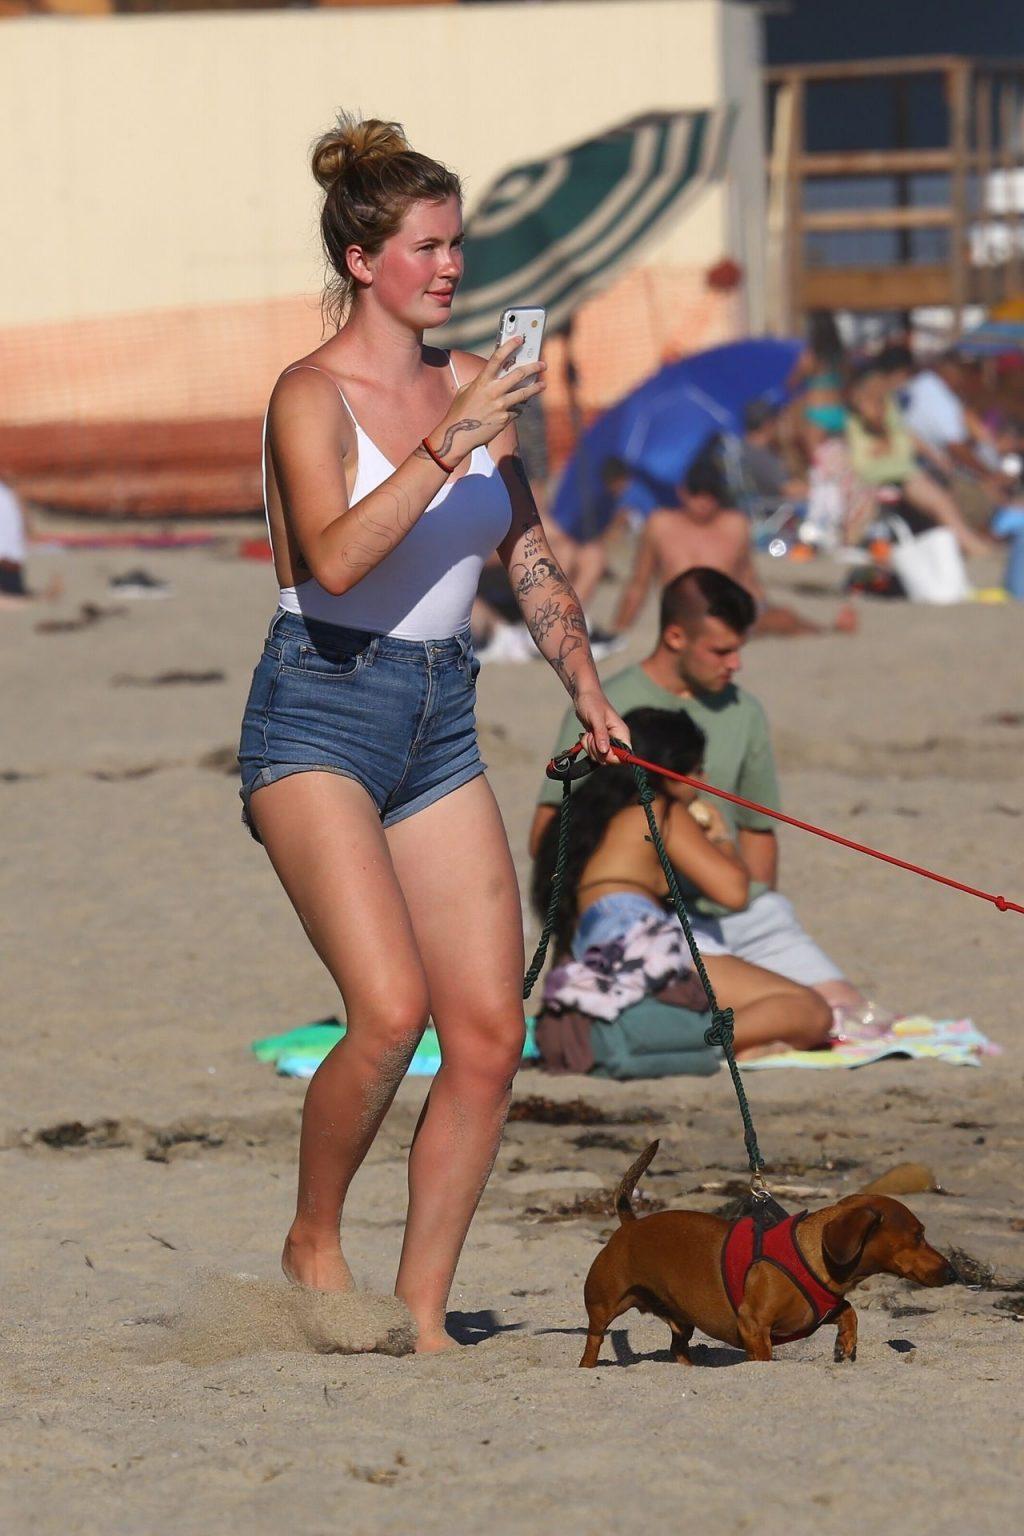 Ireland Baldwin Has a Fun Beach Day in Malibu (82 Photos)